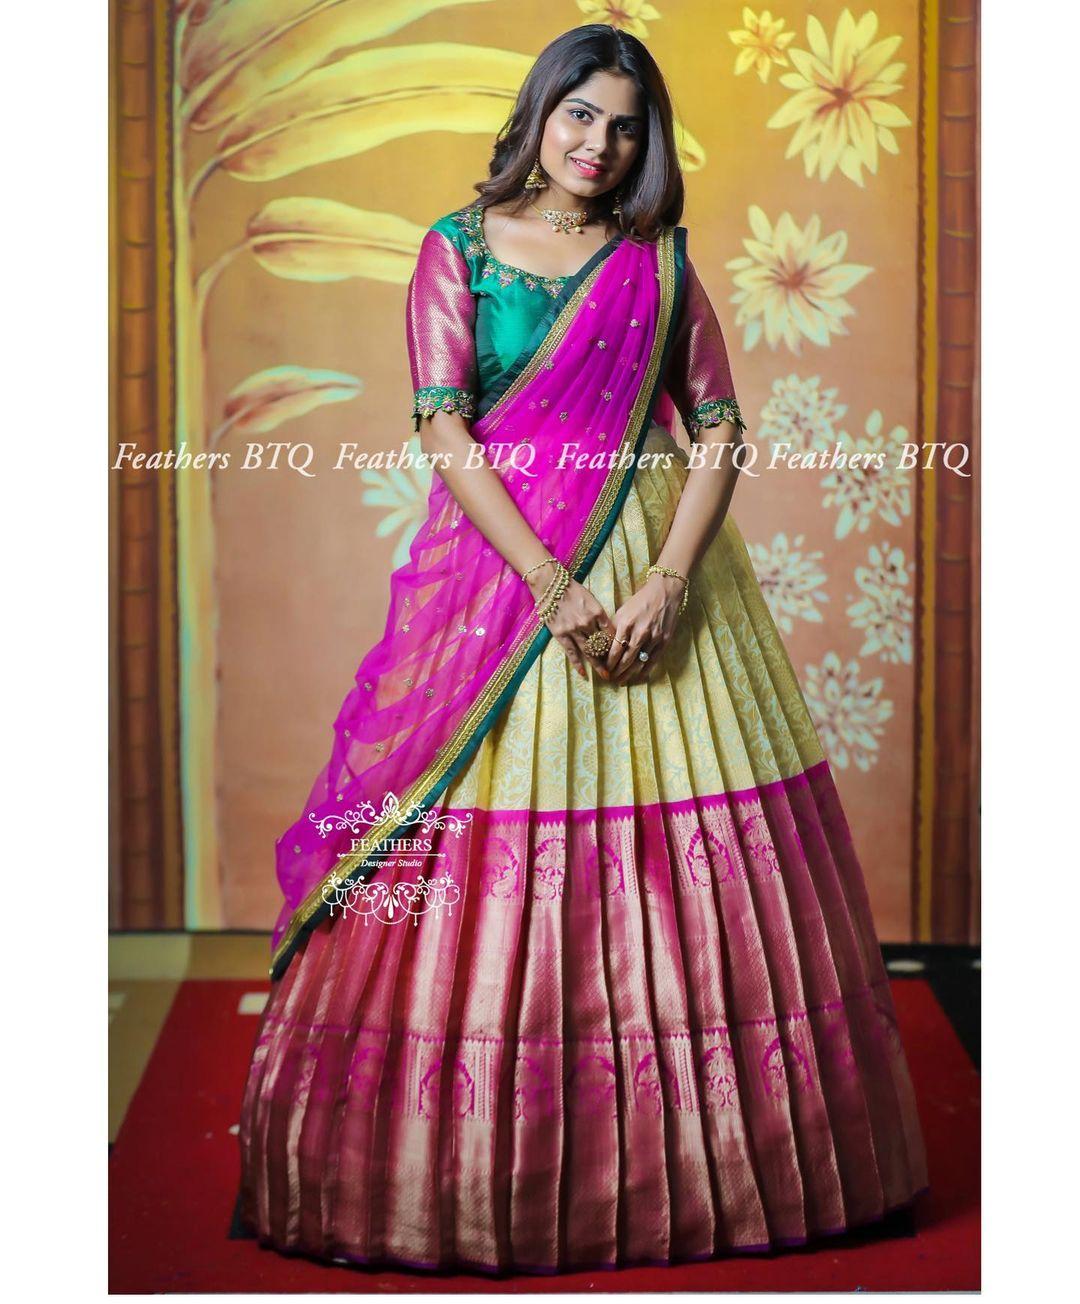 Gorgeous big boarder kanchi pattu lehenga and blouse with net dupatta. 2021-04-01